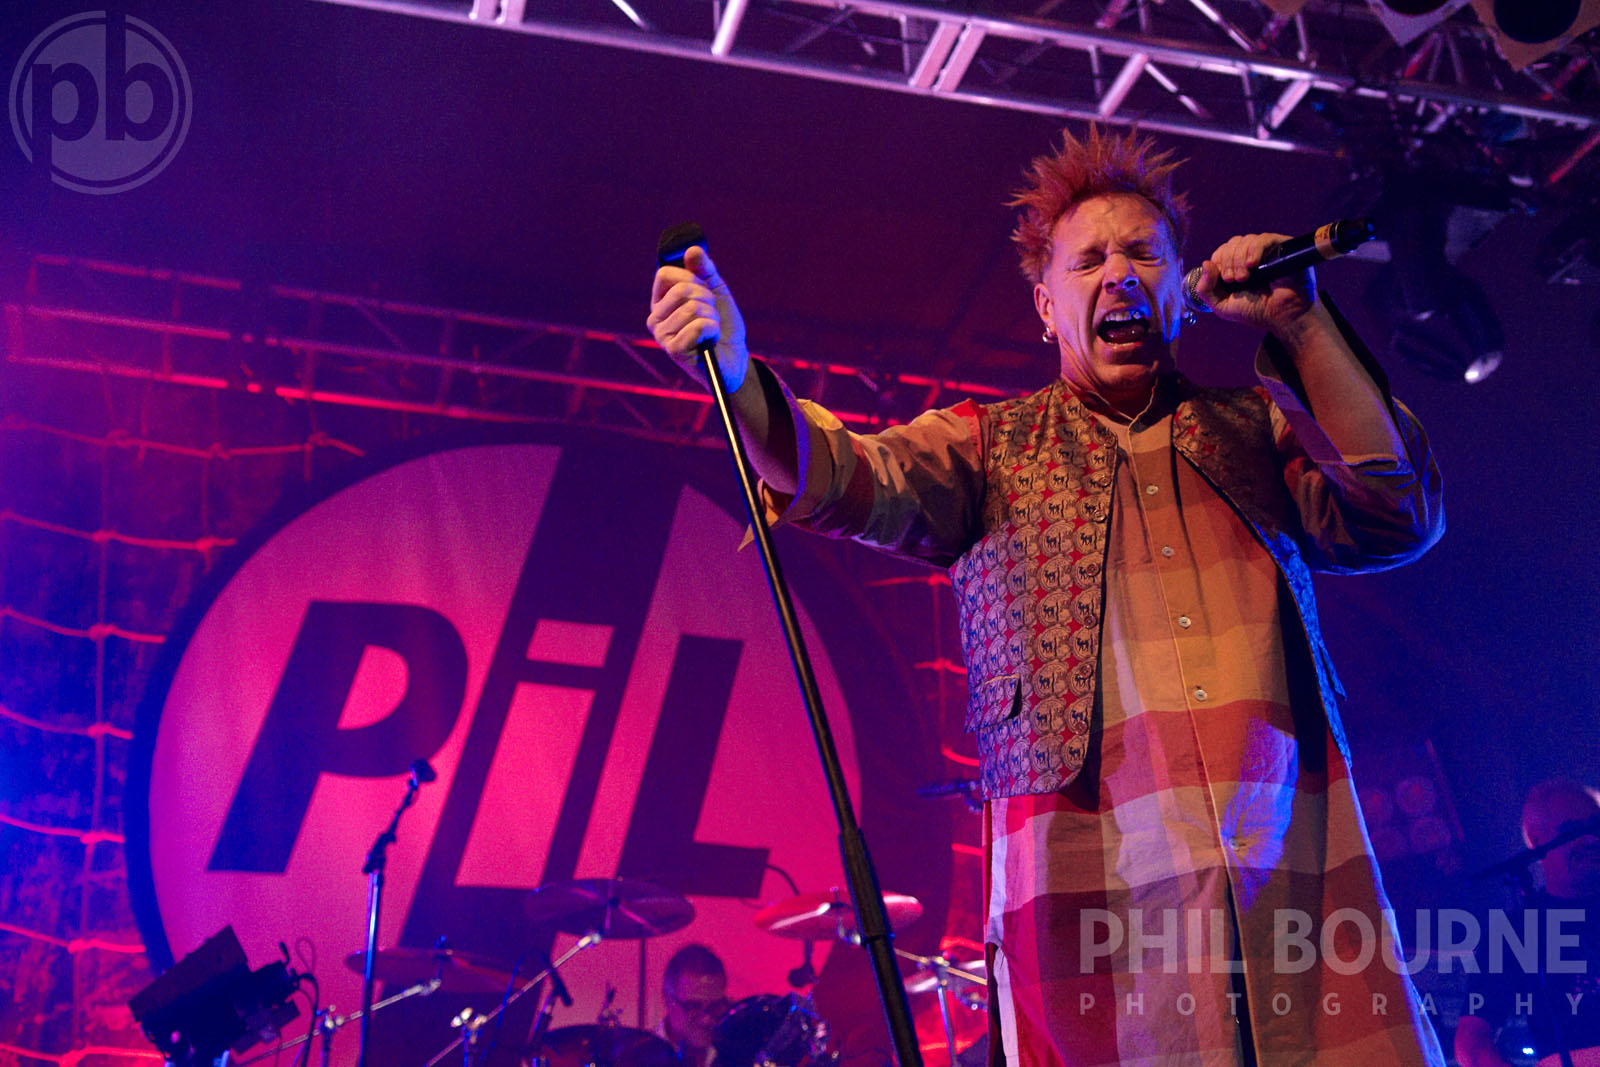 022_Live_Music_Photographer_London_PiL_John_Lydon_001.jpg